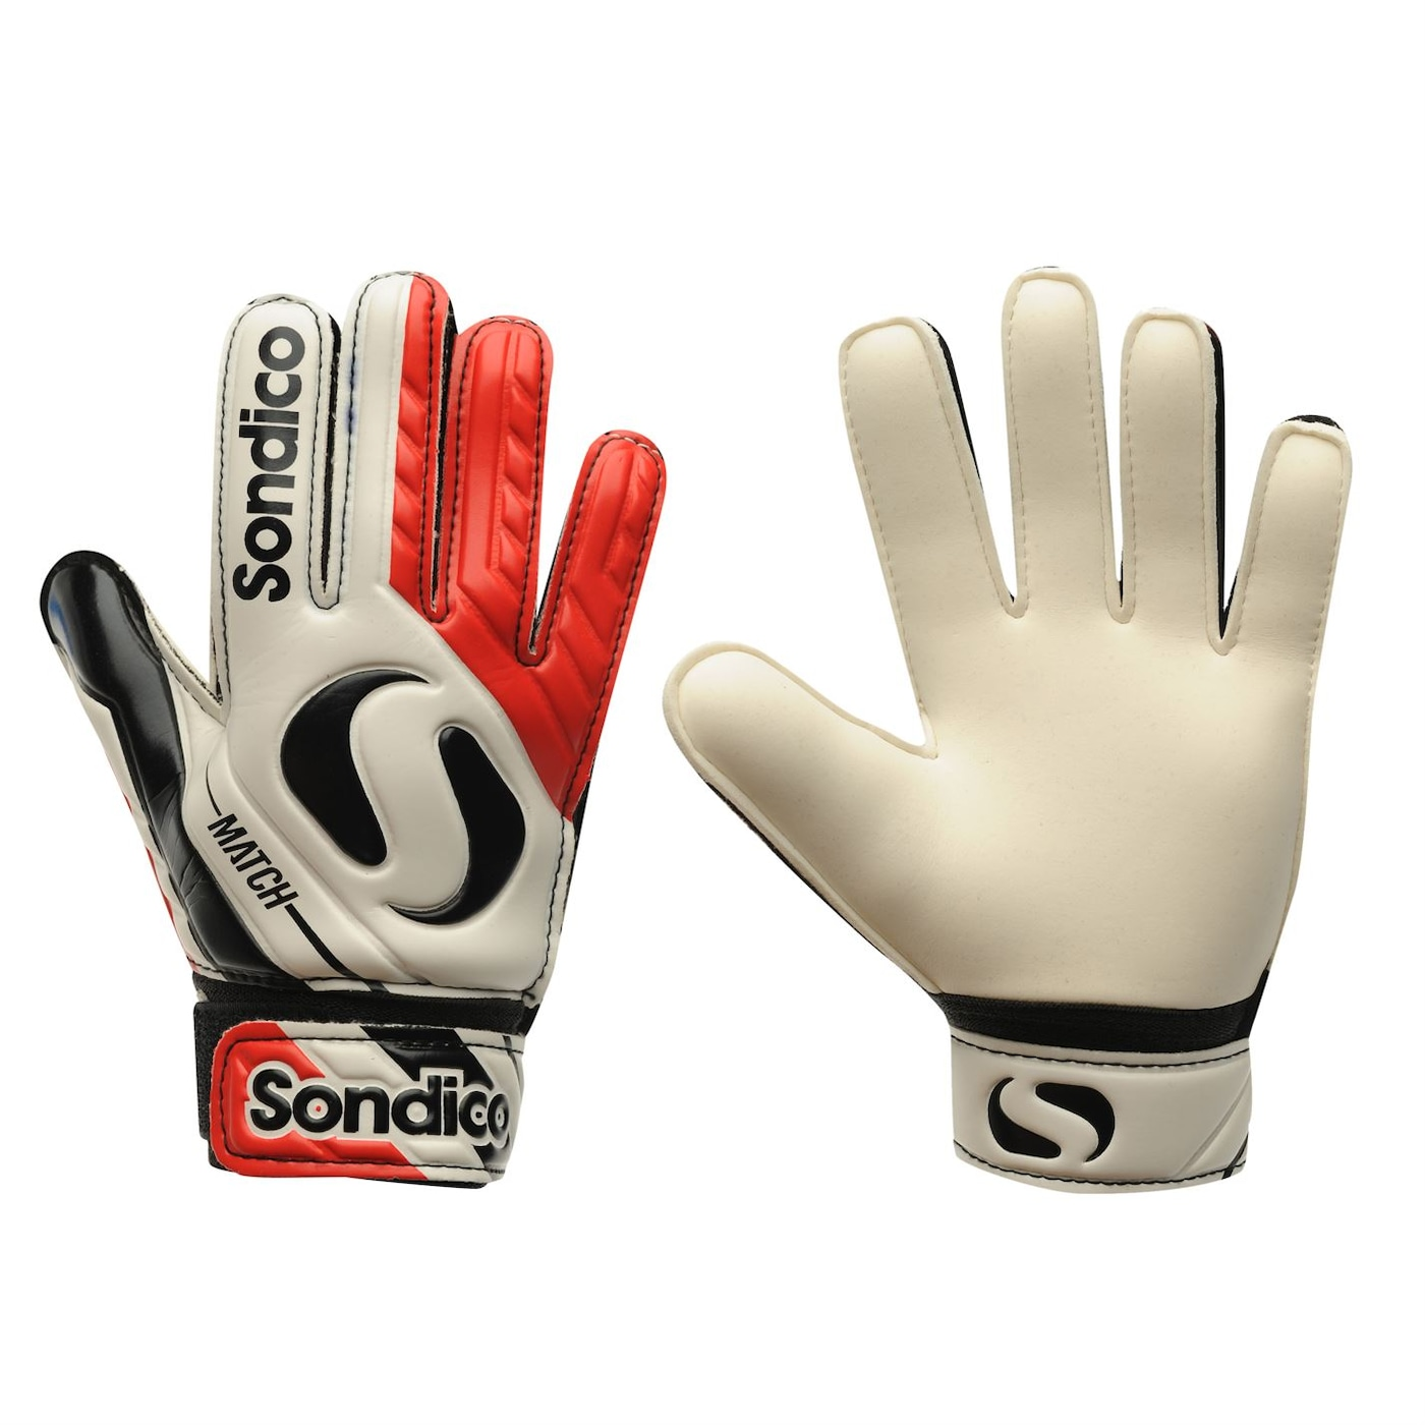 Sondico Match Junior Goalkeeper Gloves